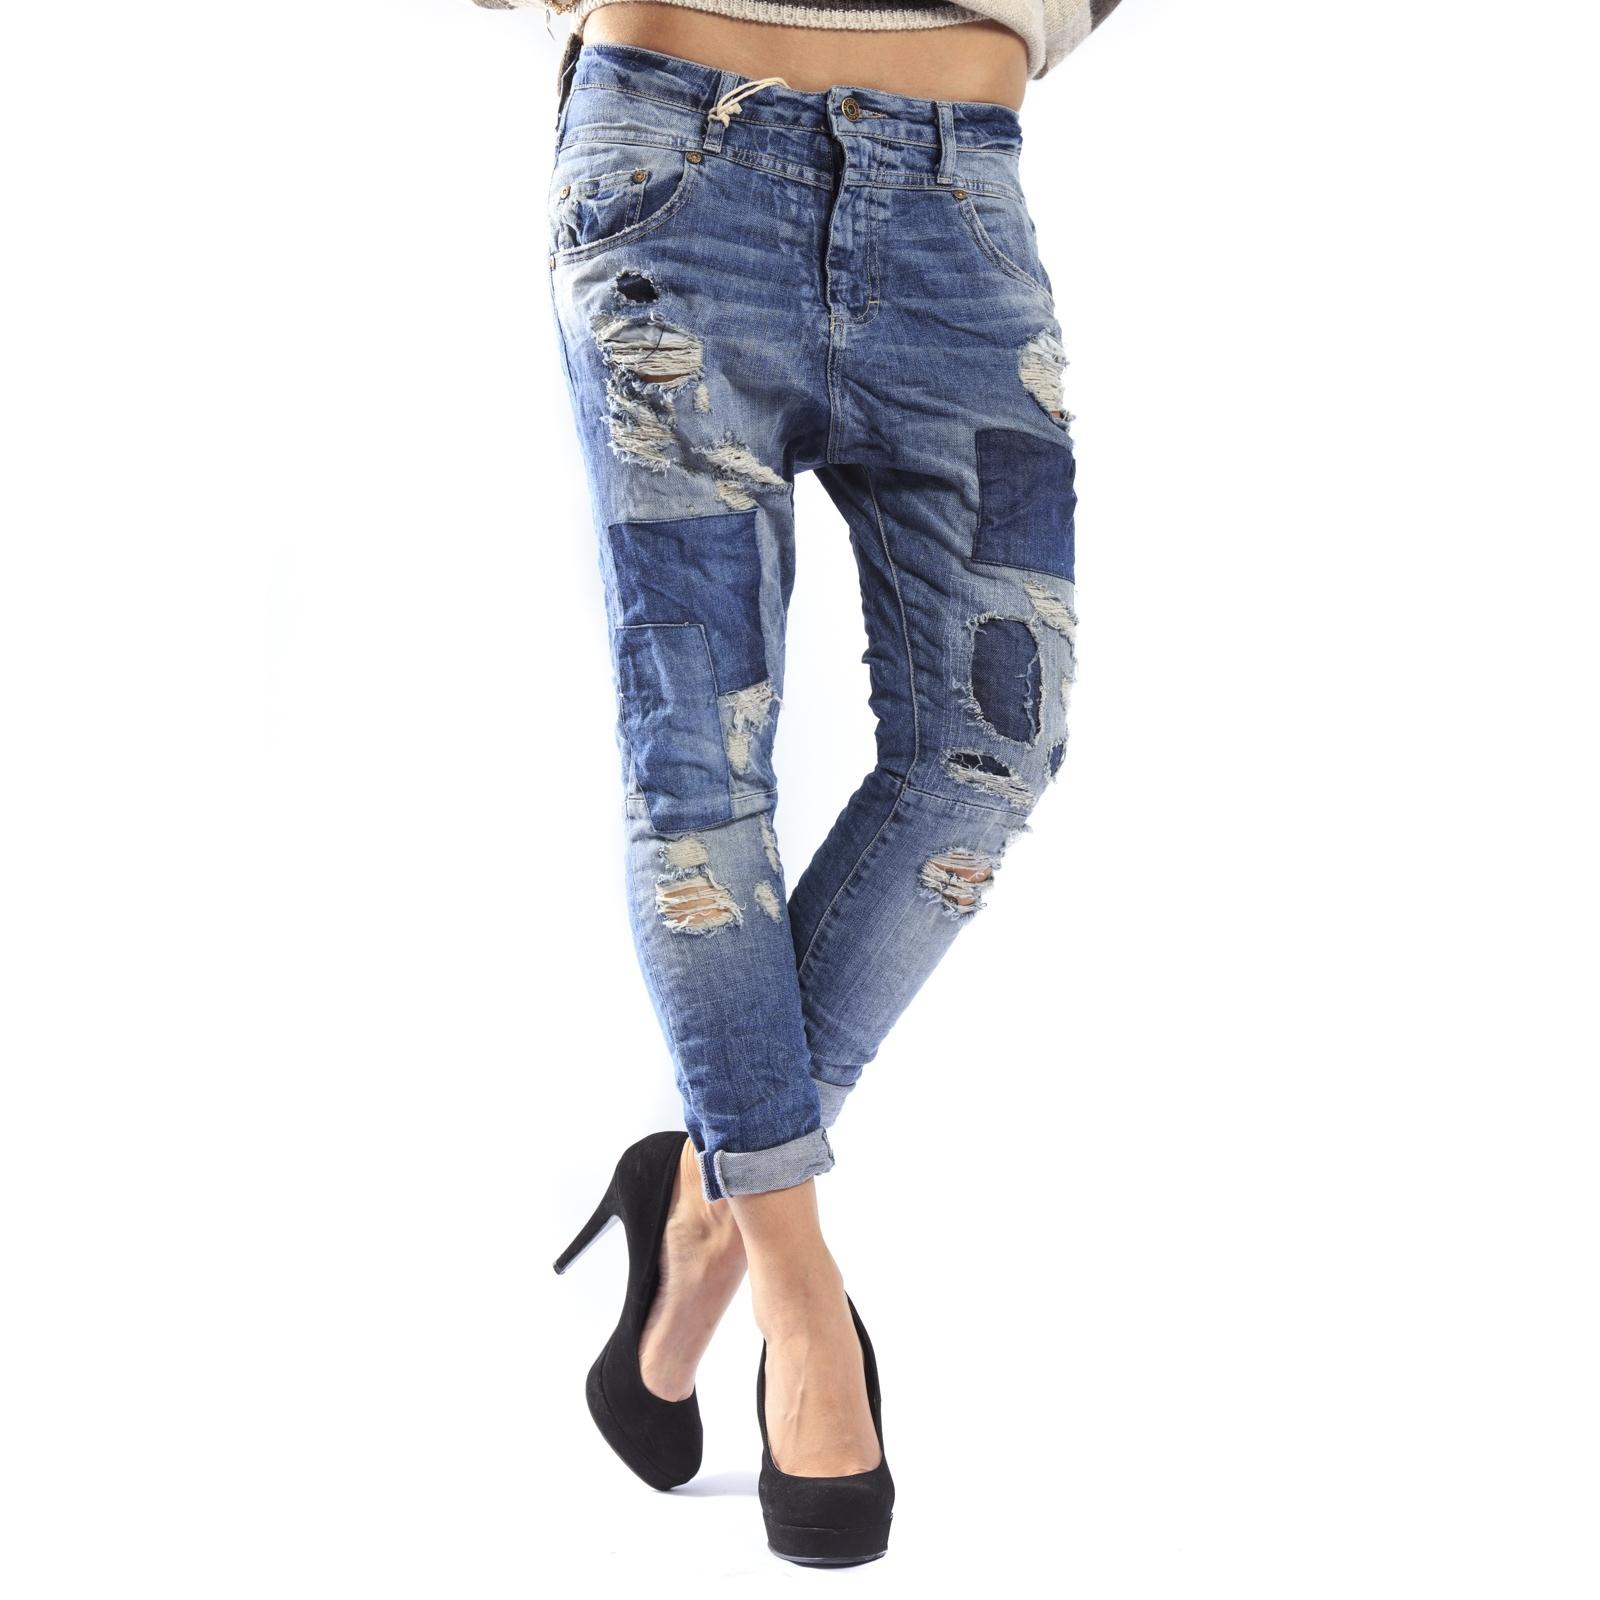 noukkia 100% aito uusin PLEASE jeans boyfriend baggy with zip patches + rips P38GBQ2UW DENIM NEW